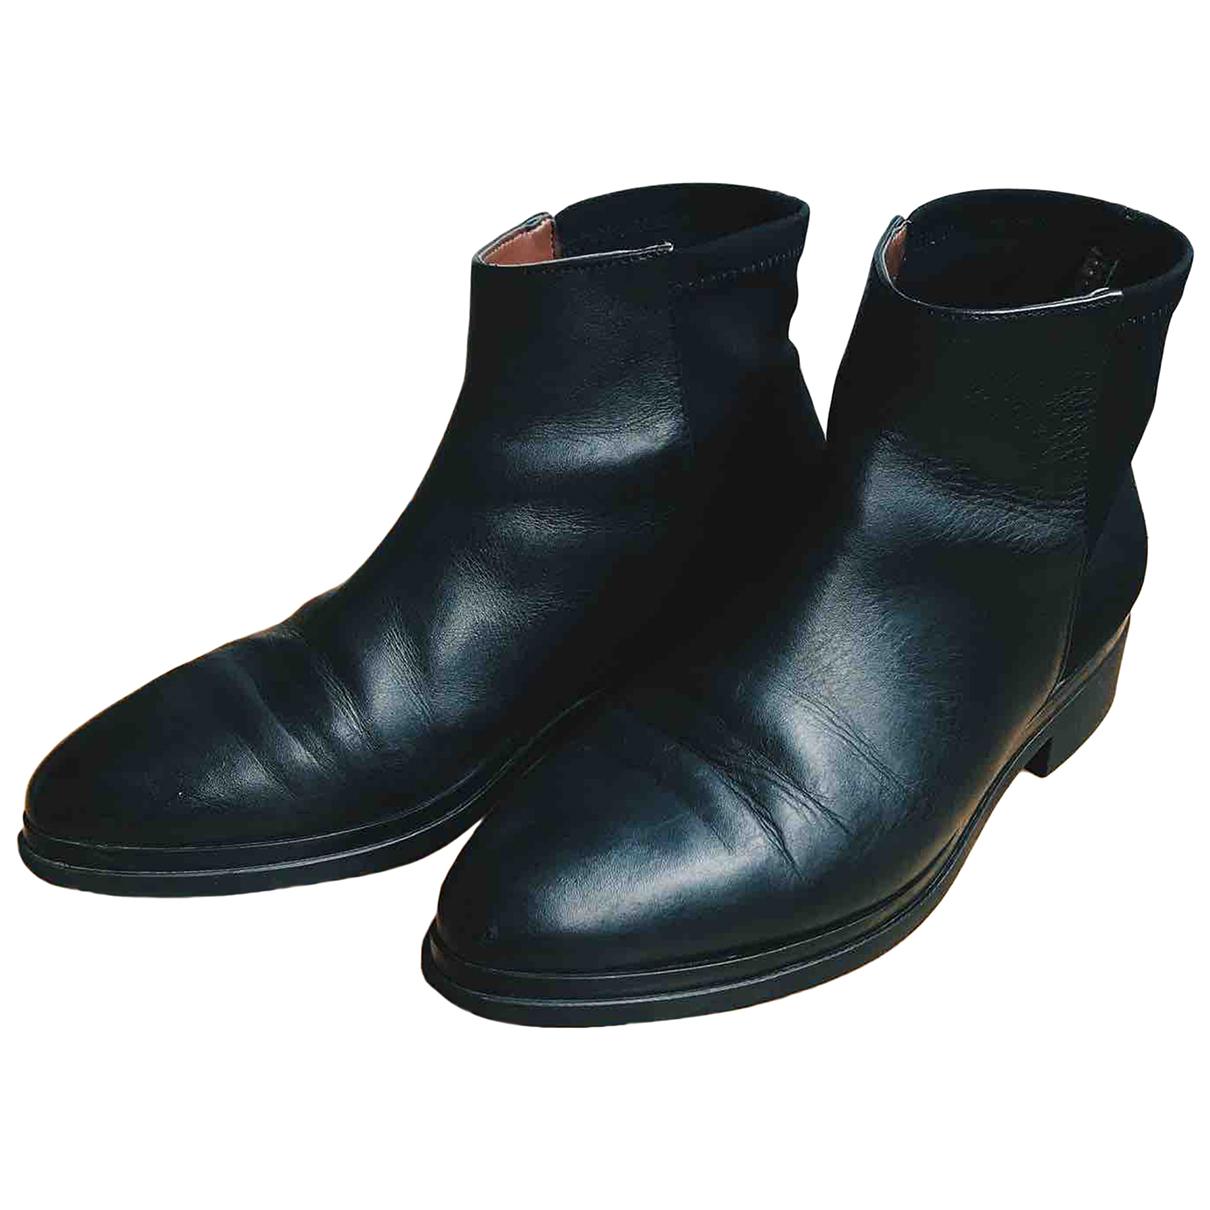 Bcbg Max Azria N Black Leather Boots for Women 40 EU